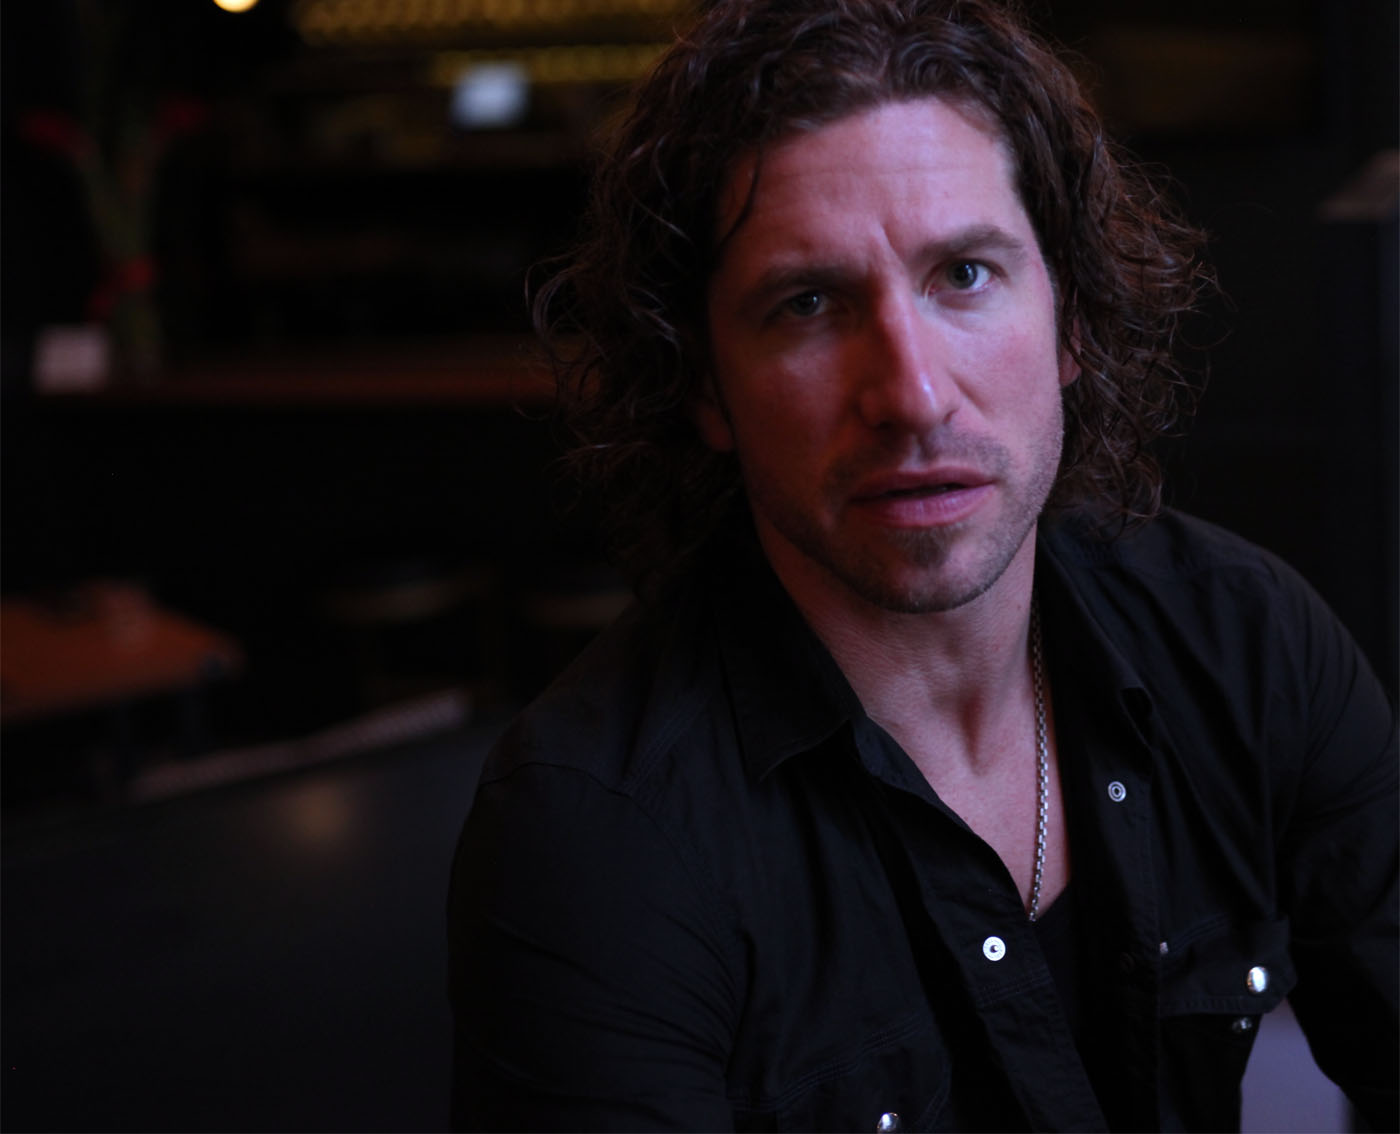 Jonas Tomalty, Entrevue avec Jonas à son nouvea